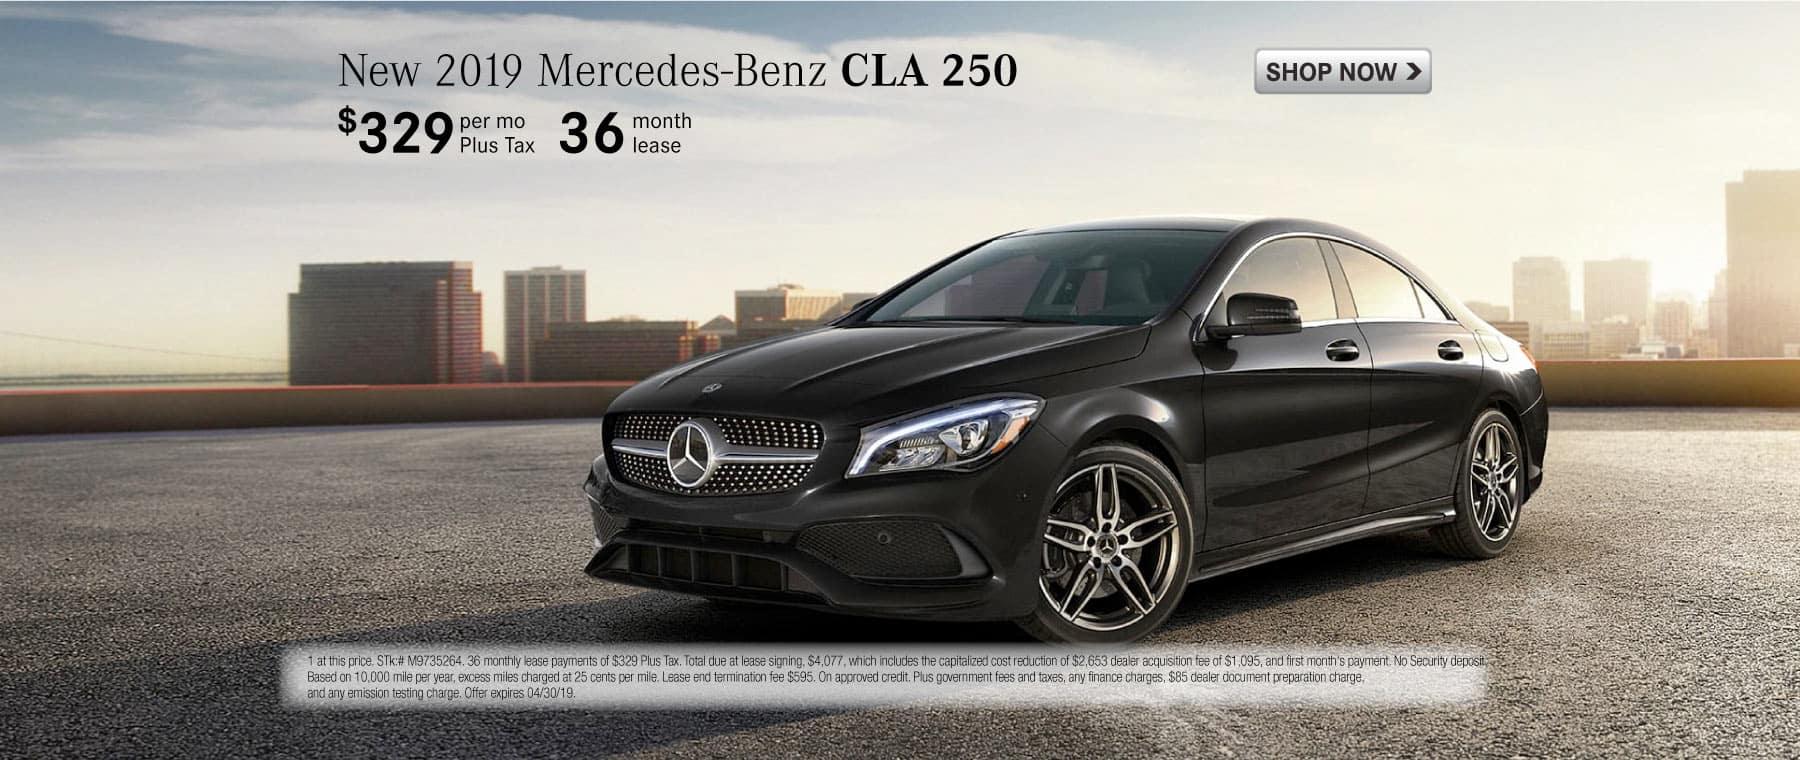 2019 Mercdes-Benz CLA 250